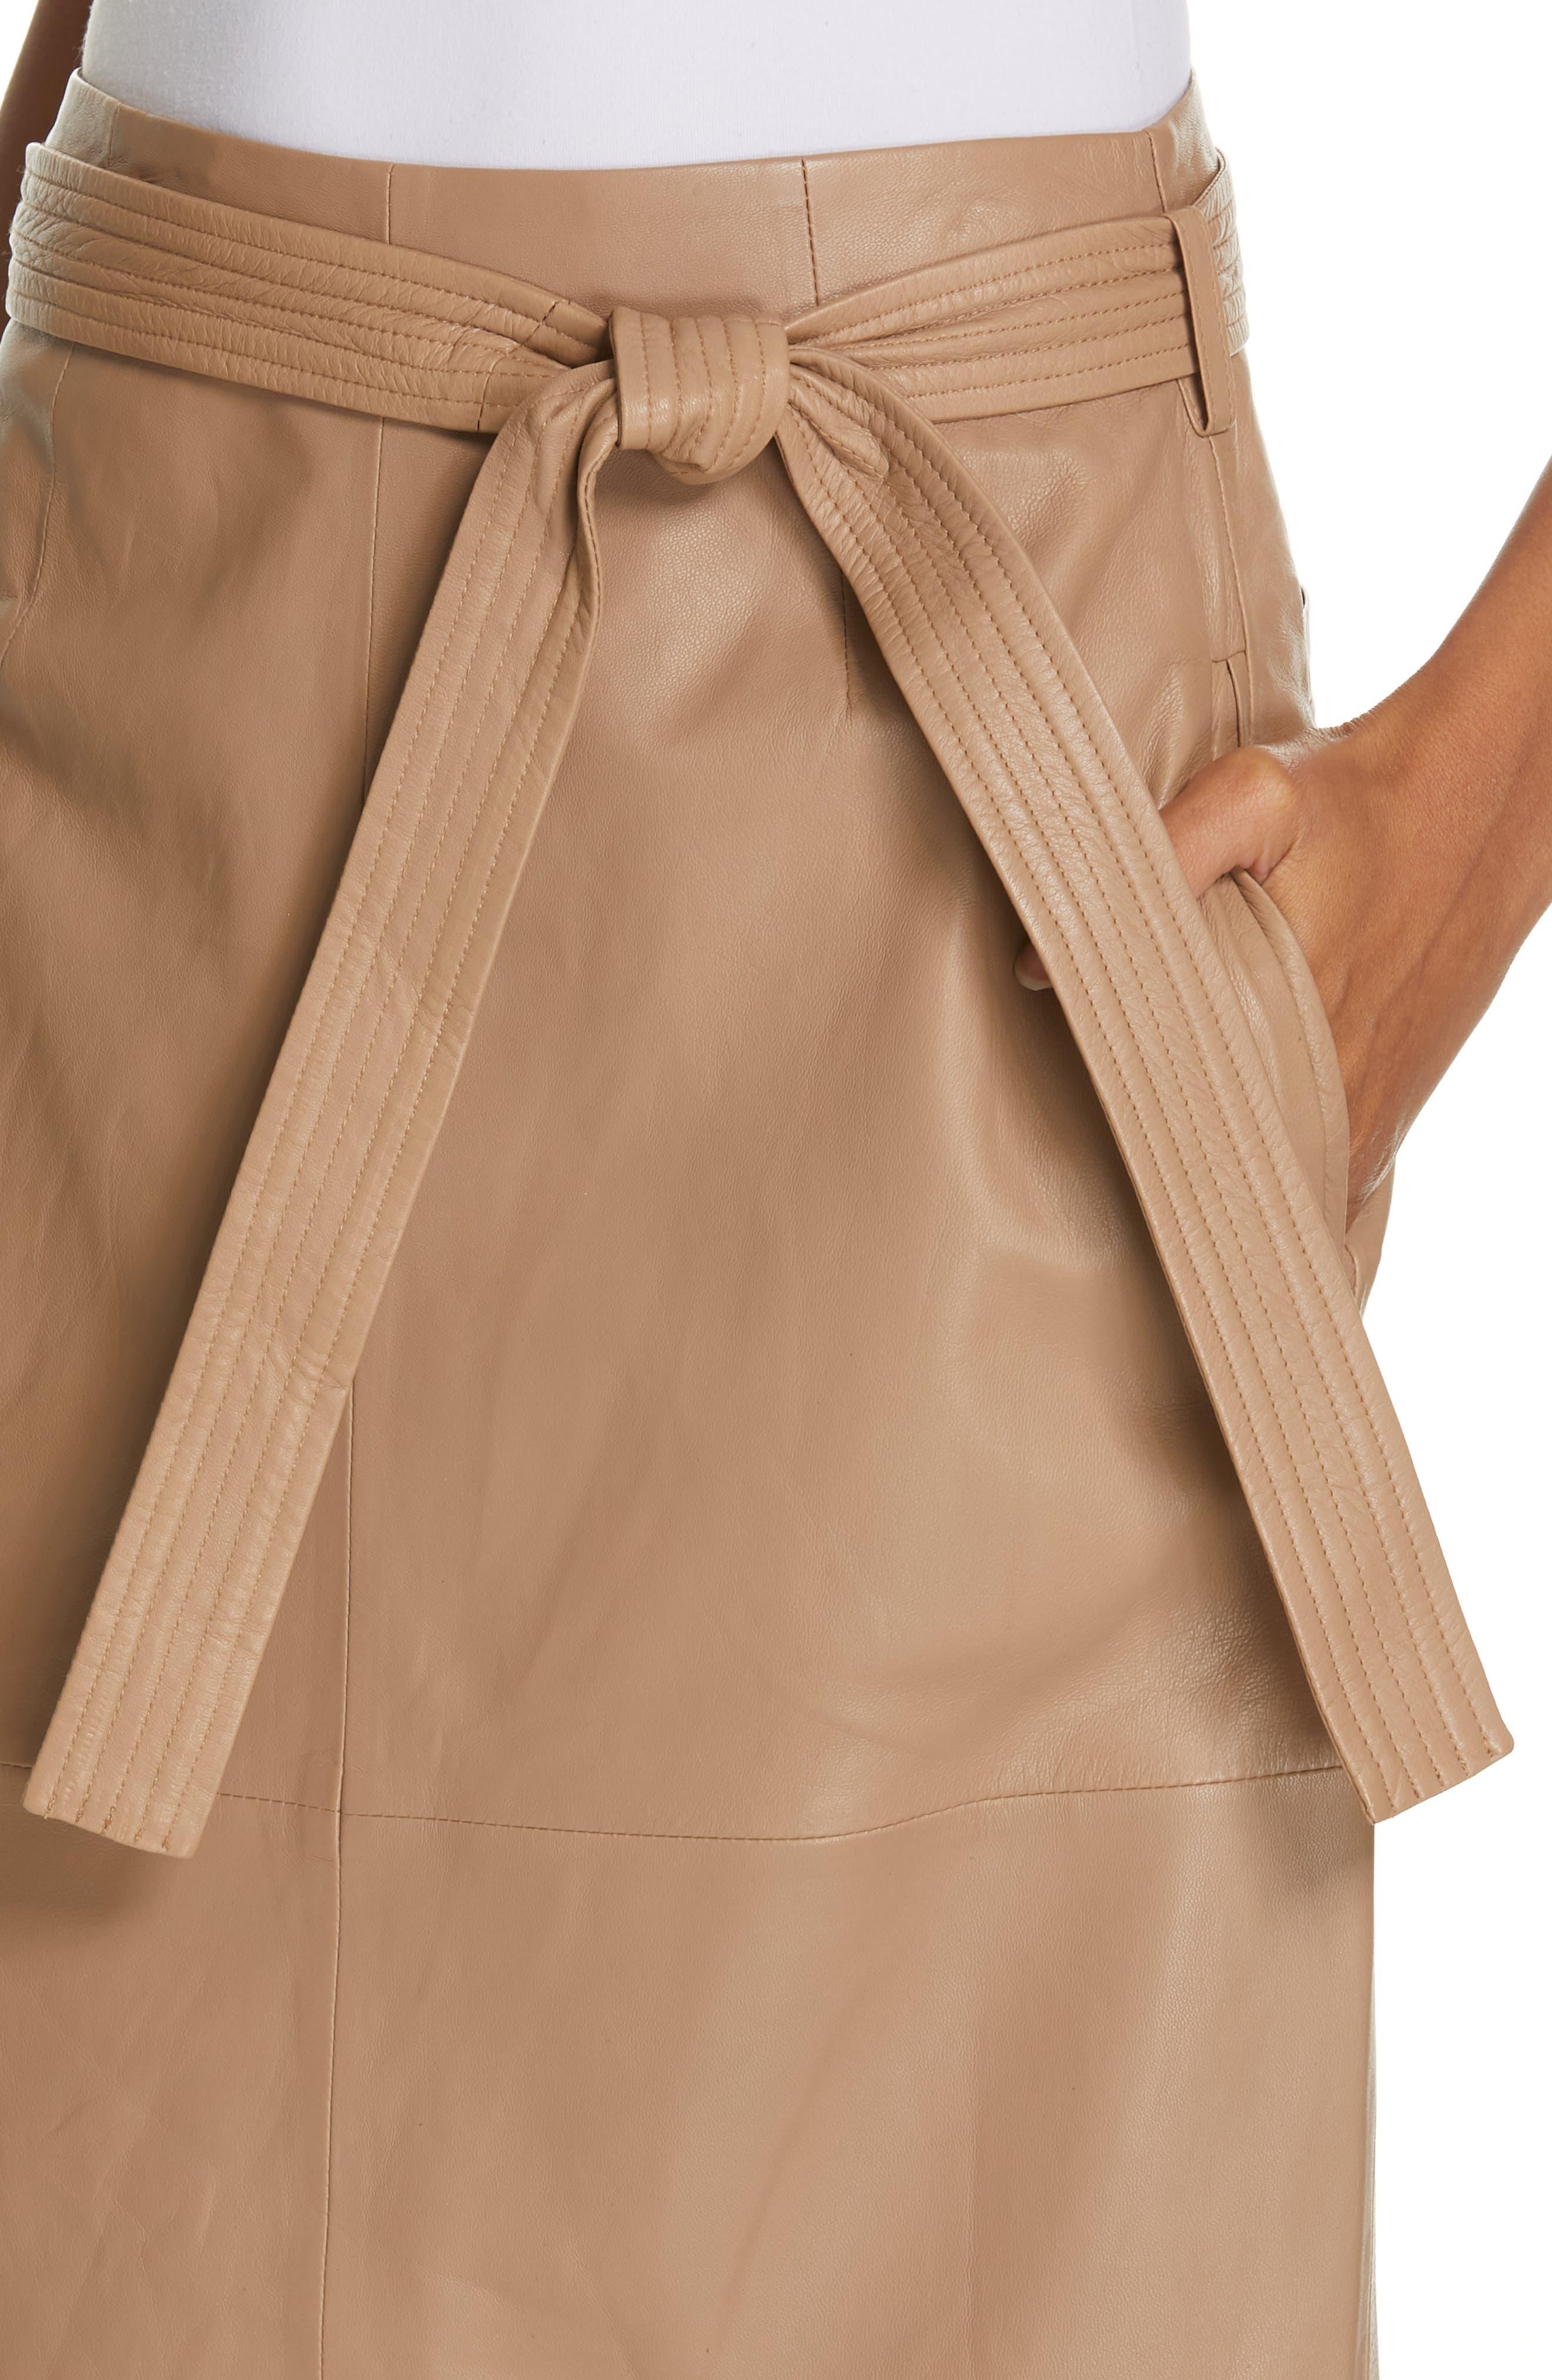 Alouetta Leather Skirt,                             Alternate thumbnail 4, color,                             BOIS